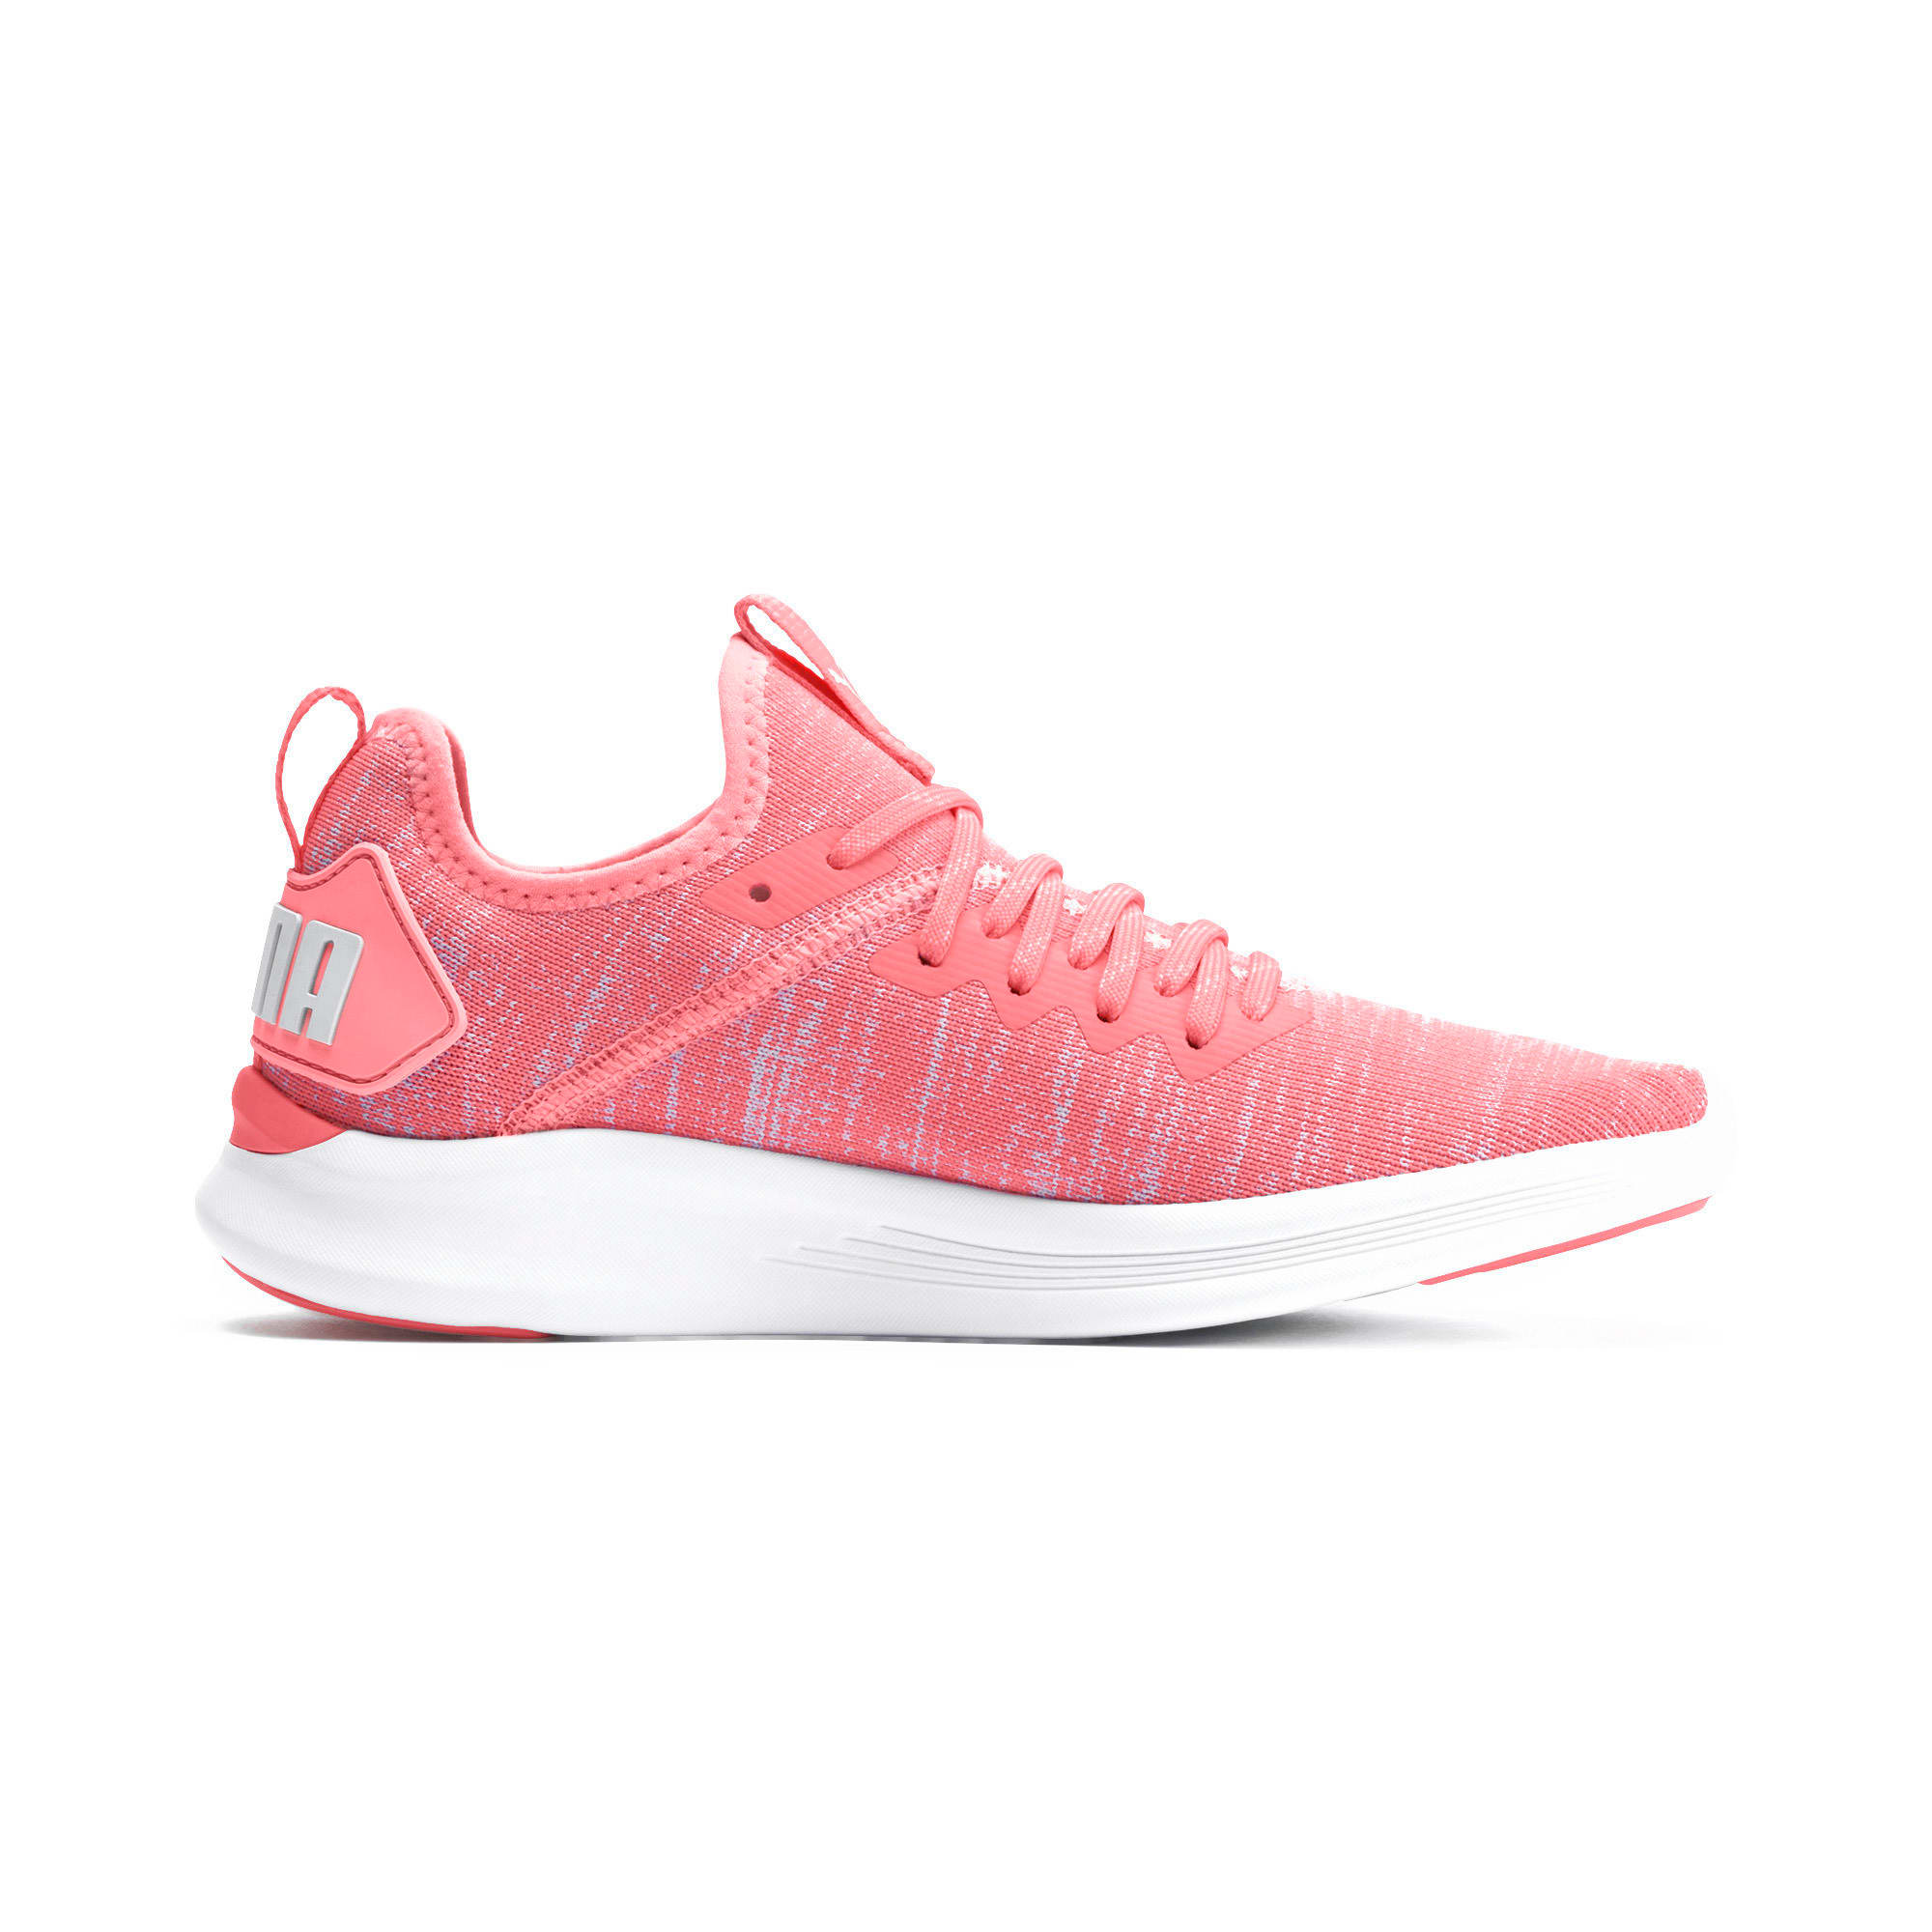 Thumbnail 6 of IGNITE Flash evoKNIT Women's Running Shoes, Bright Peach-Puma White, medium